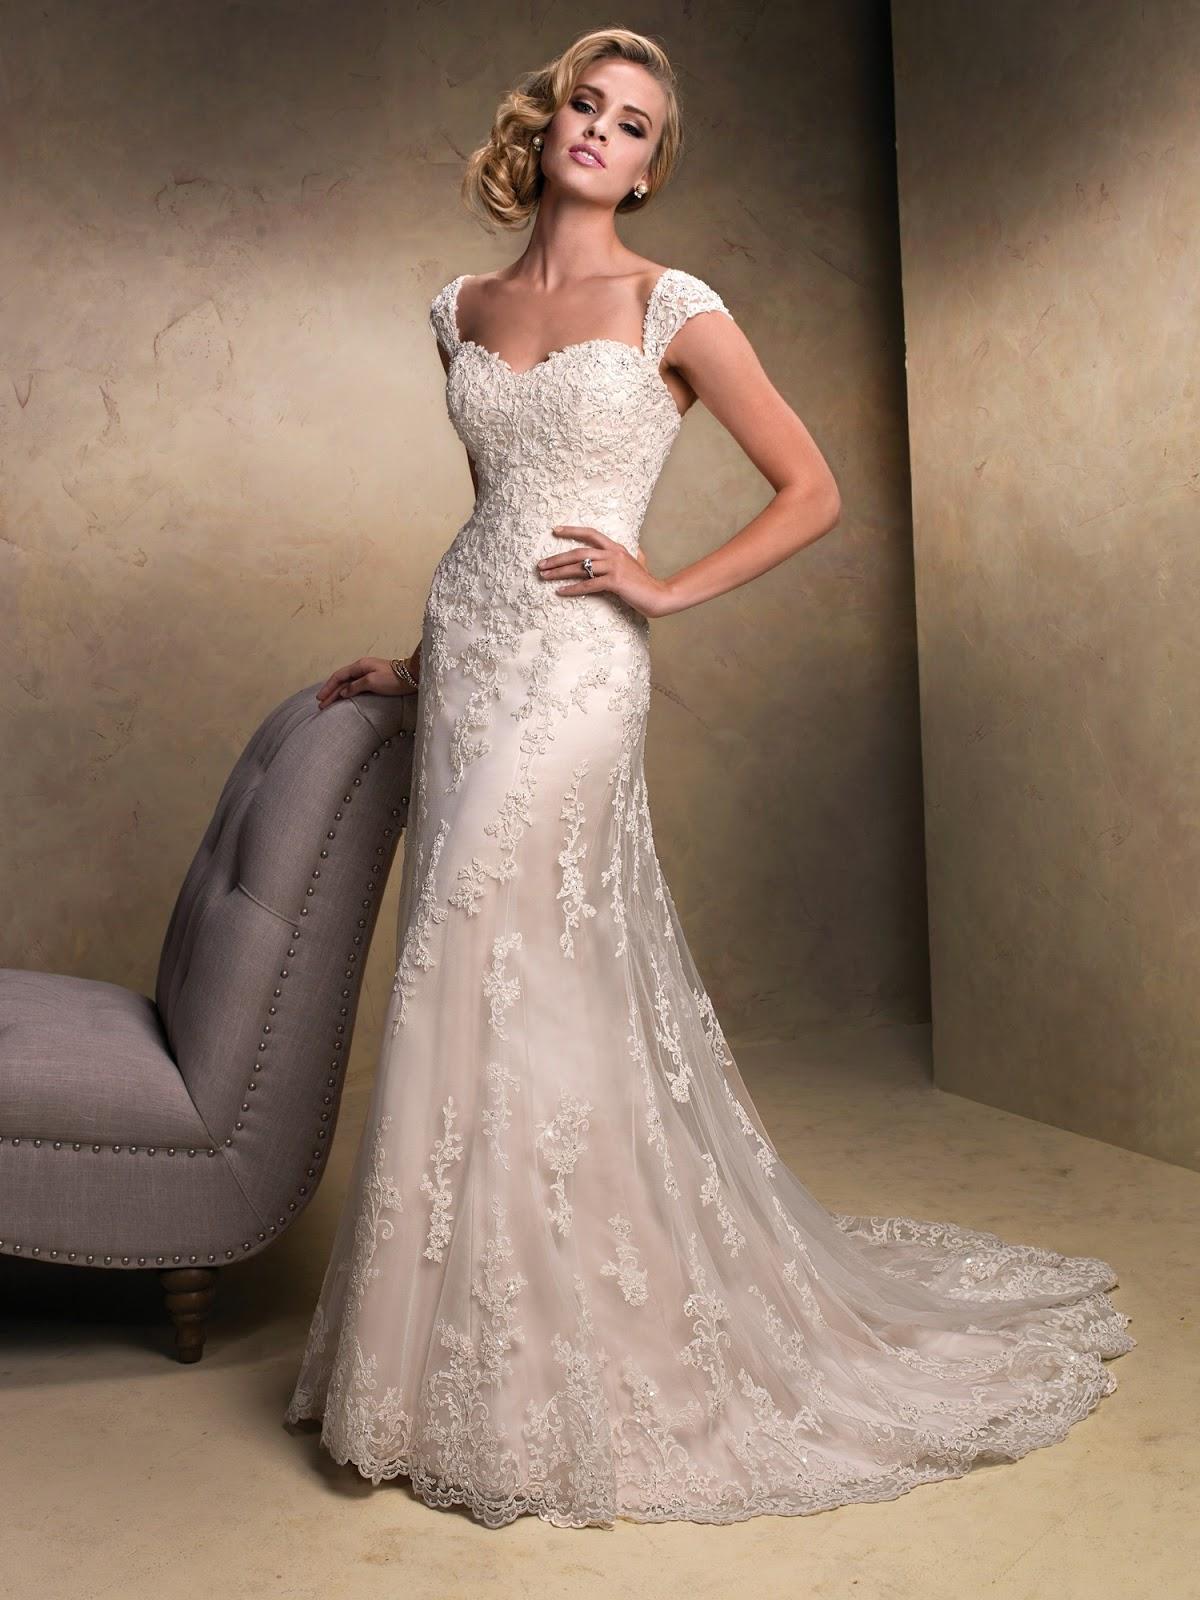 Lace Bridal Gowns Under 1000